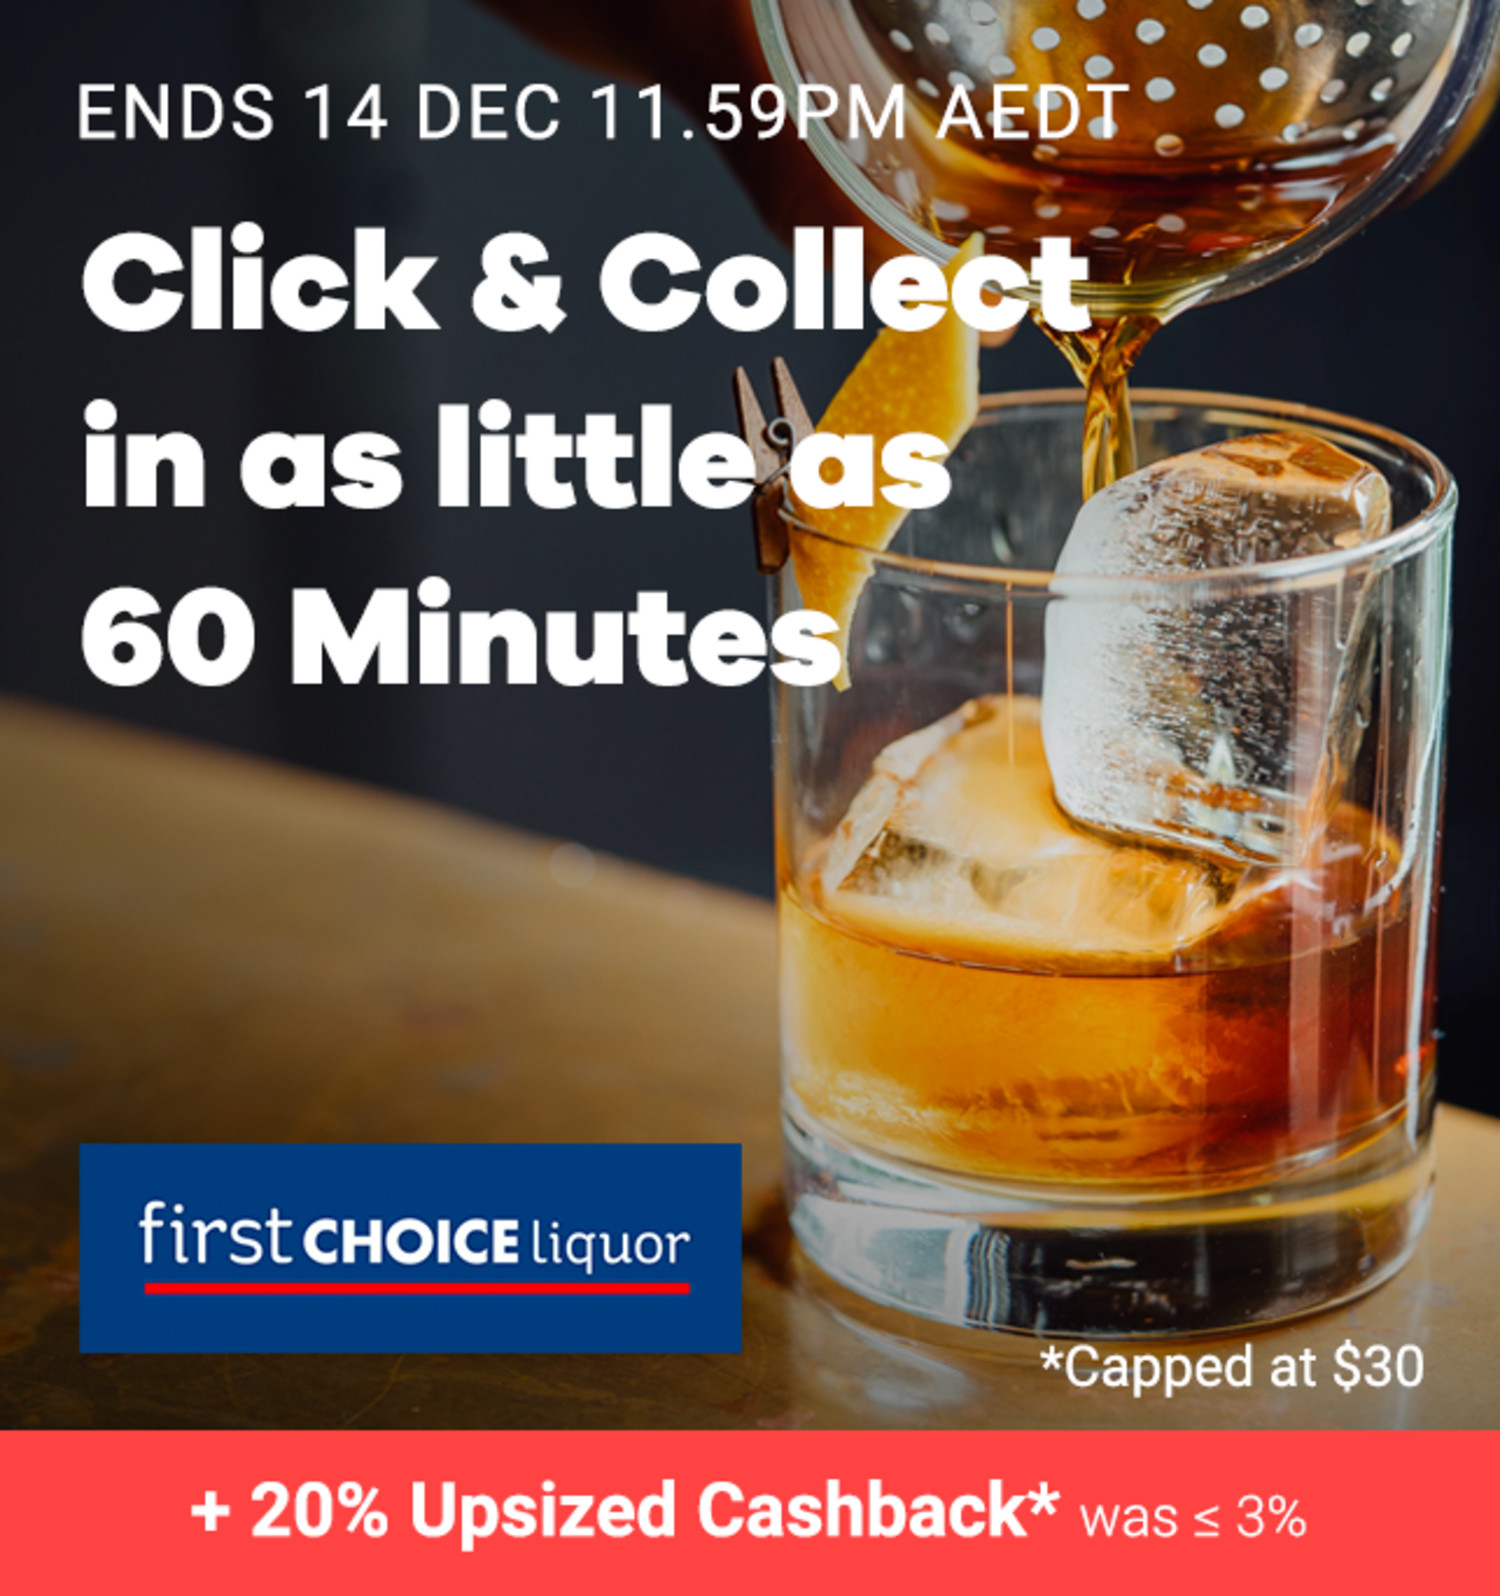 First Choice Liquor - 20% Upsized Cashback